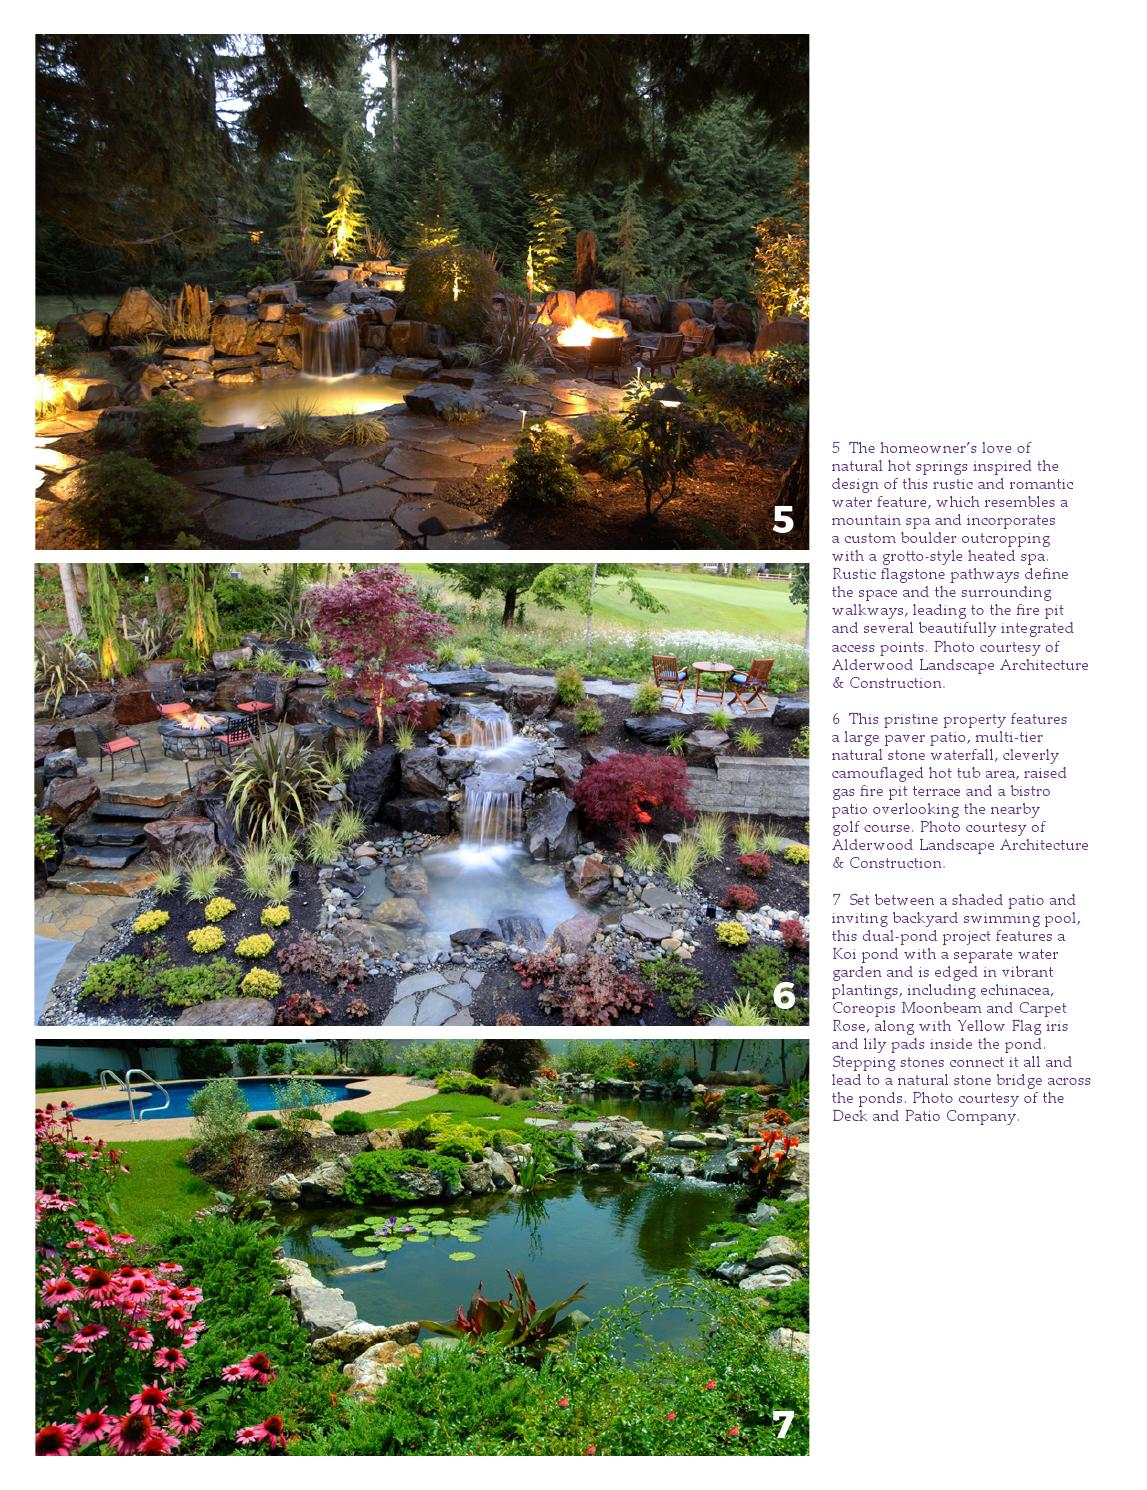 kentucky homes u0026 gardens magazine by kentucky homes u0026 gardens issuu